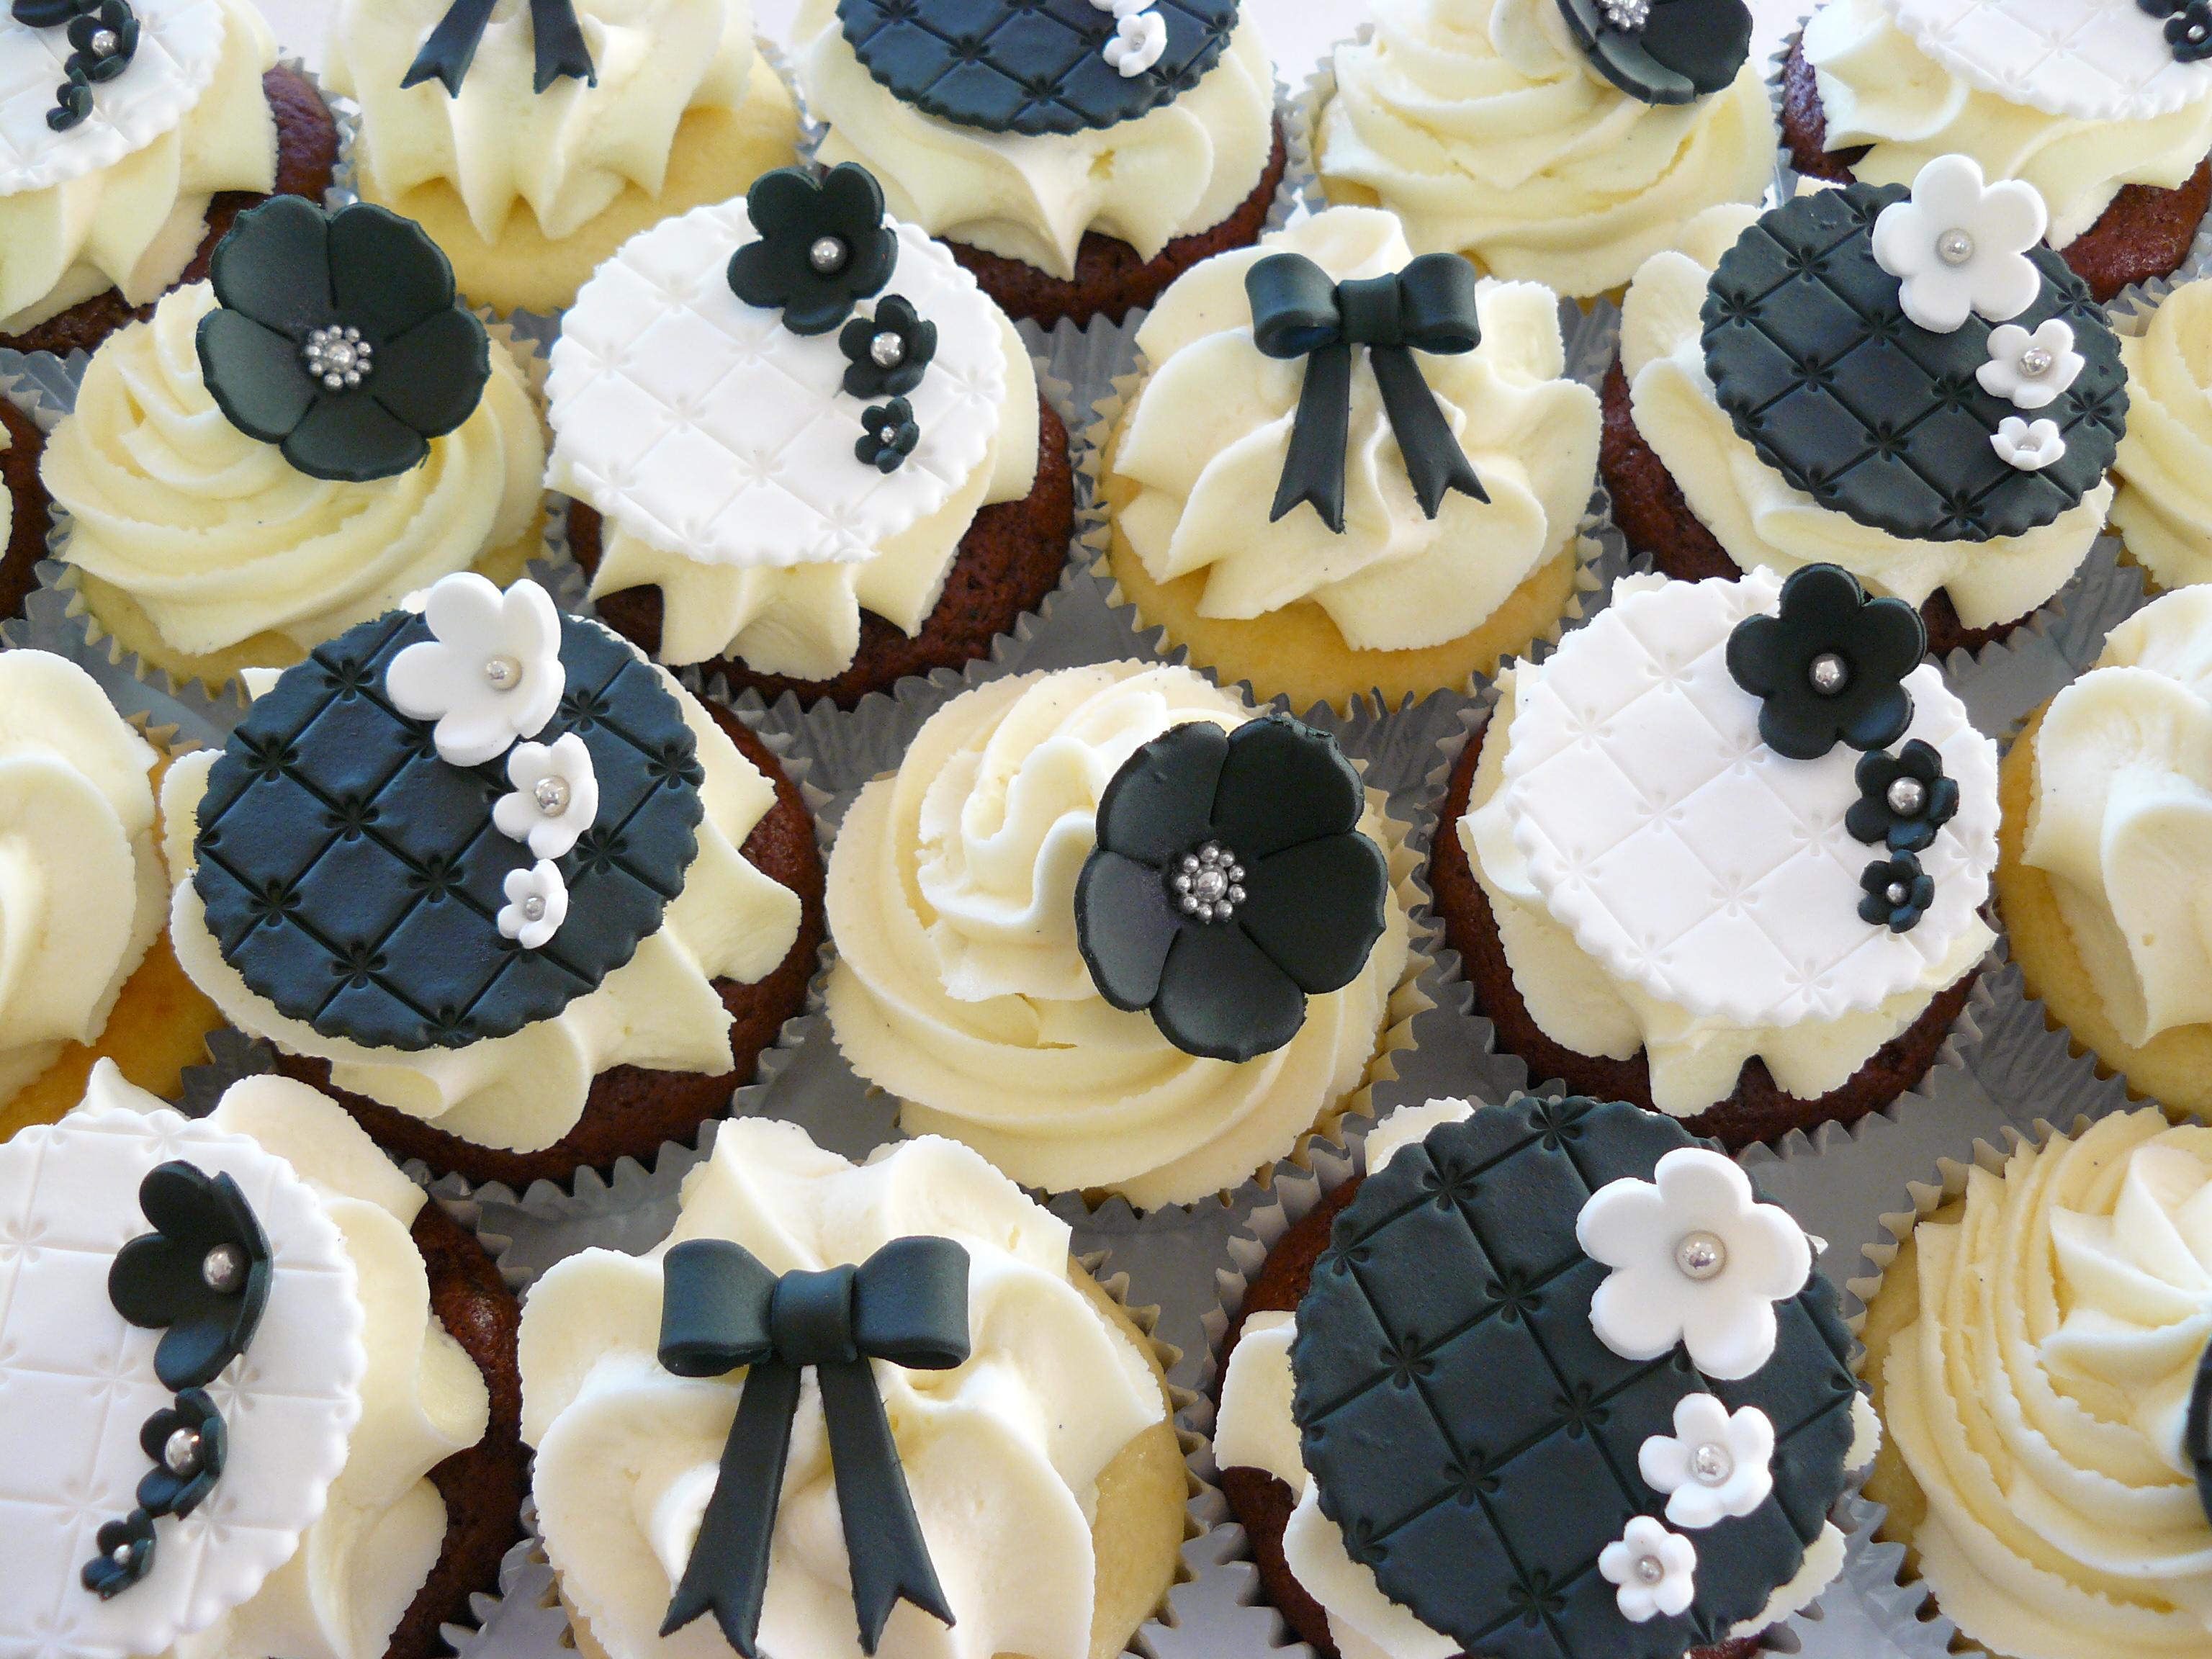 Elegant Black and White Wedding Cupcakes